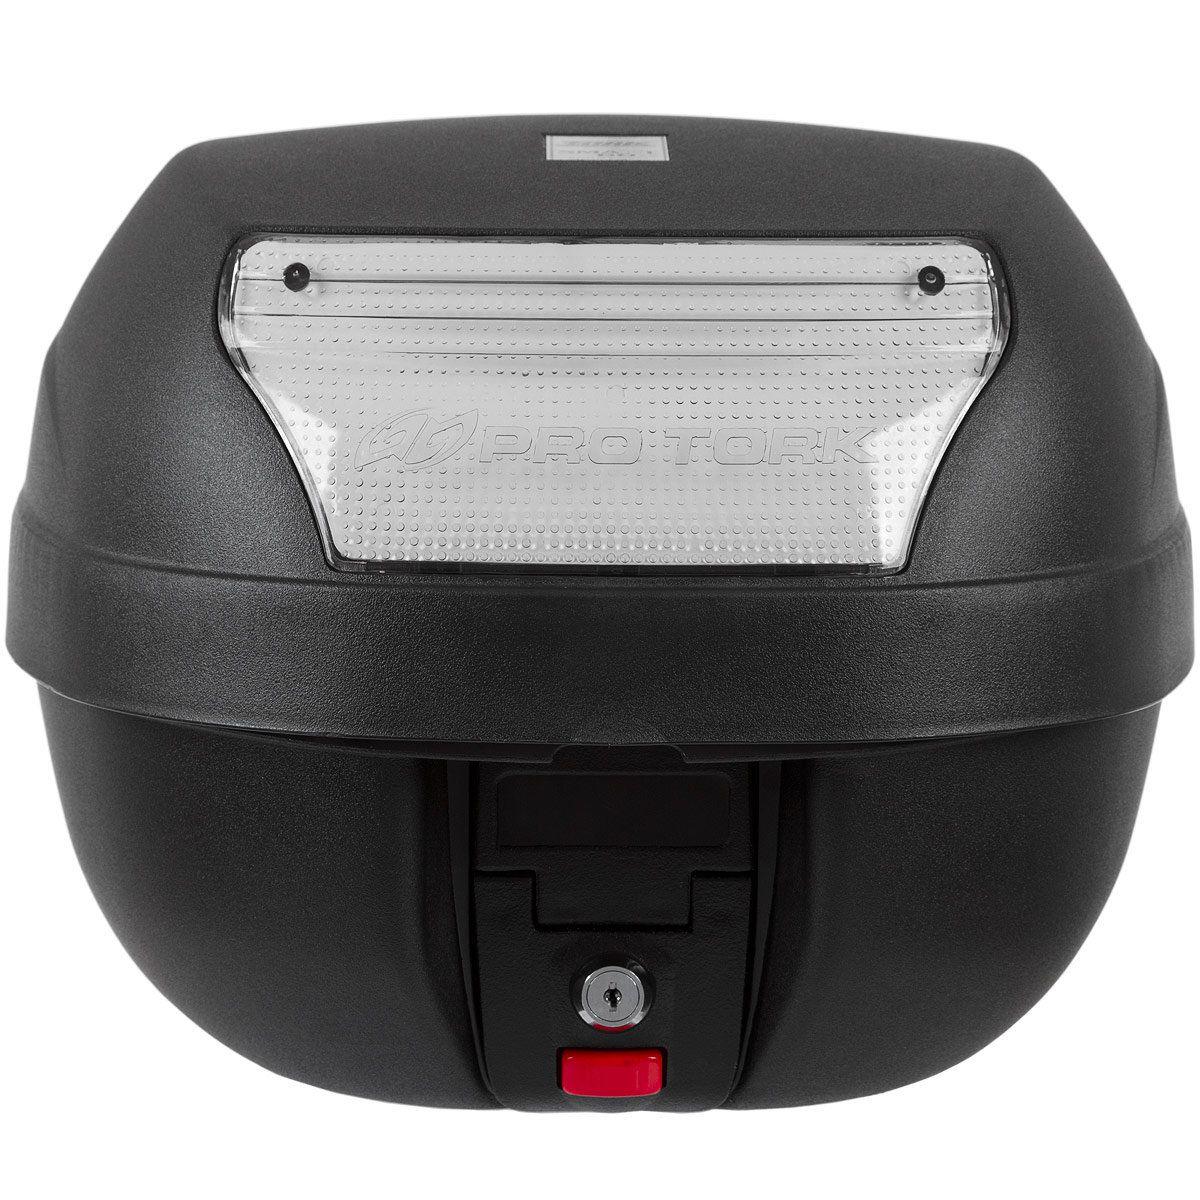 Lente com Defletor para Bauleto Smart Box 28L  - Motorshopp